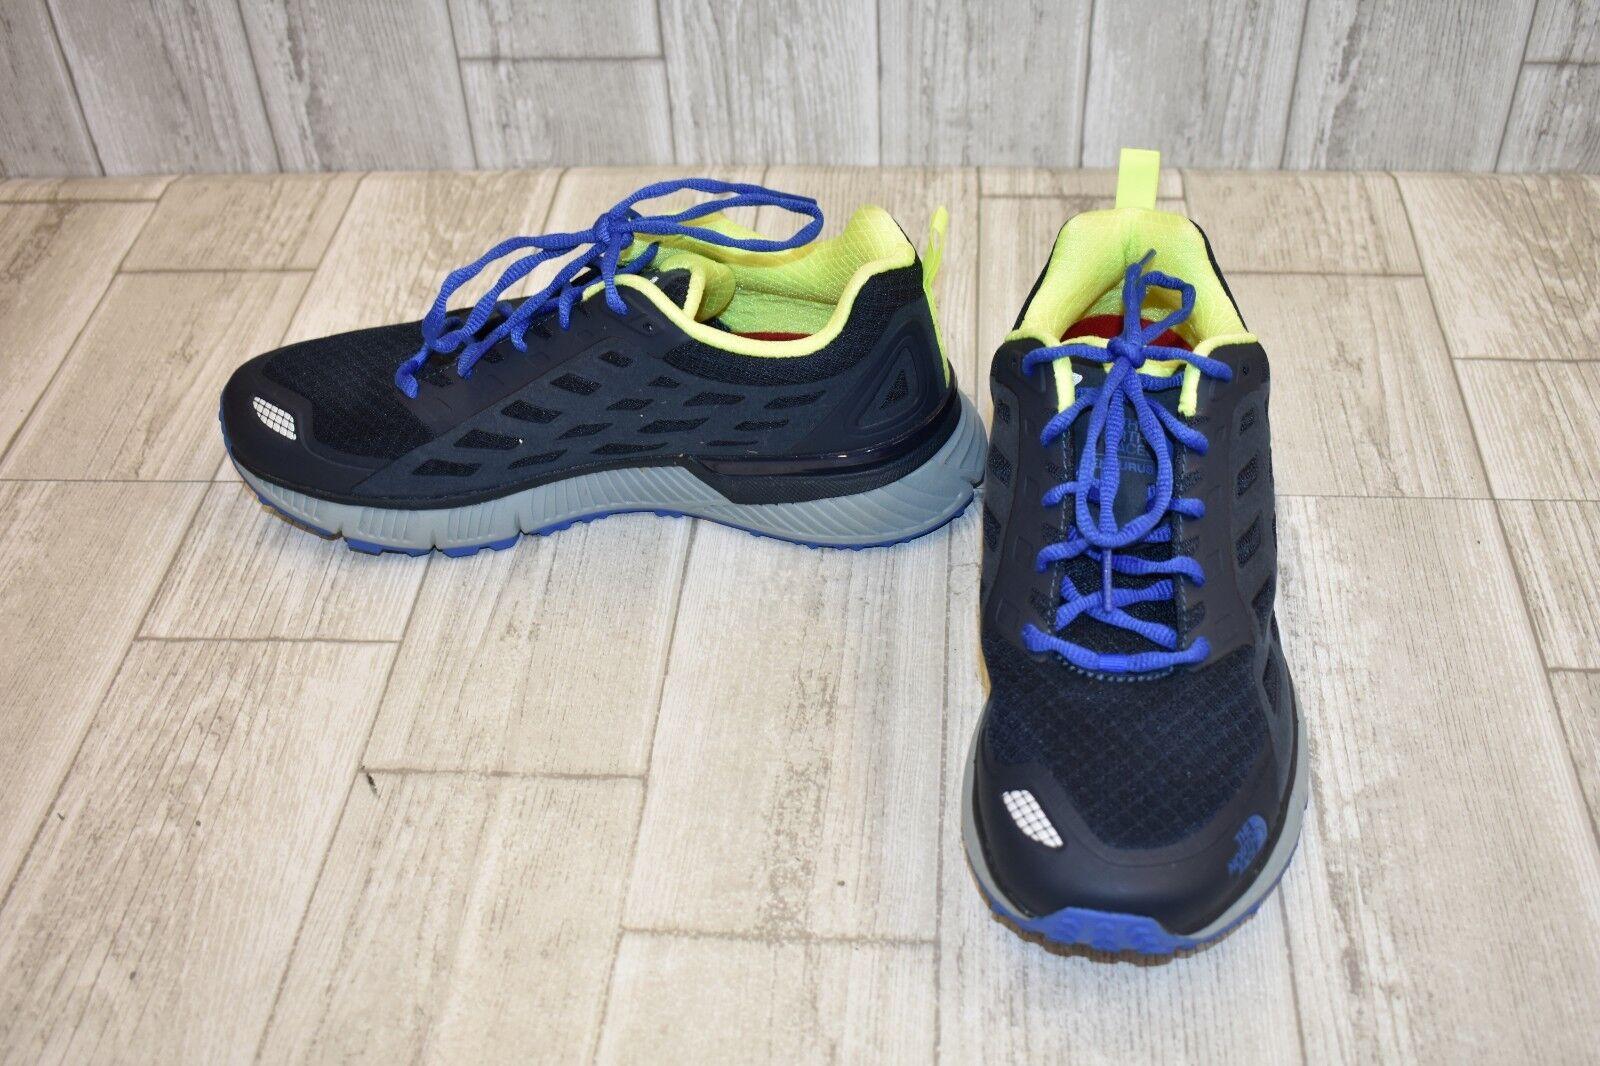 The North Face endurus TR Trail Running Zapatos, Para Hombres Azul Marino Amarillo